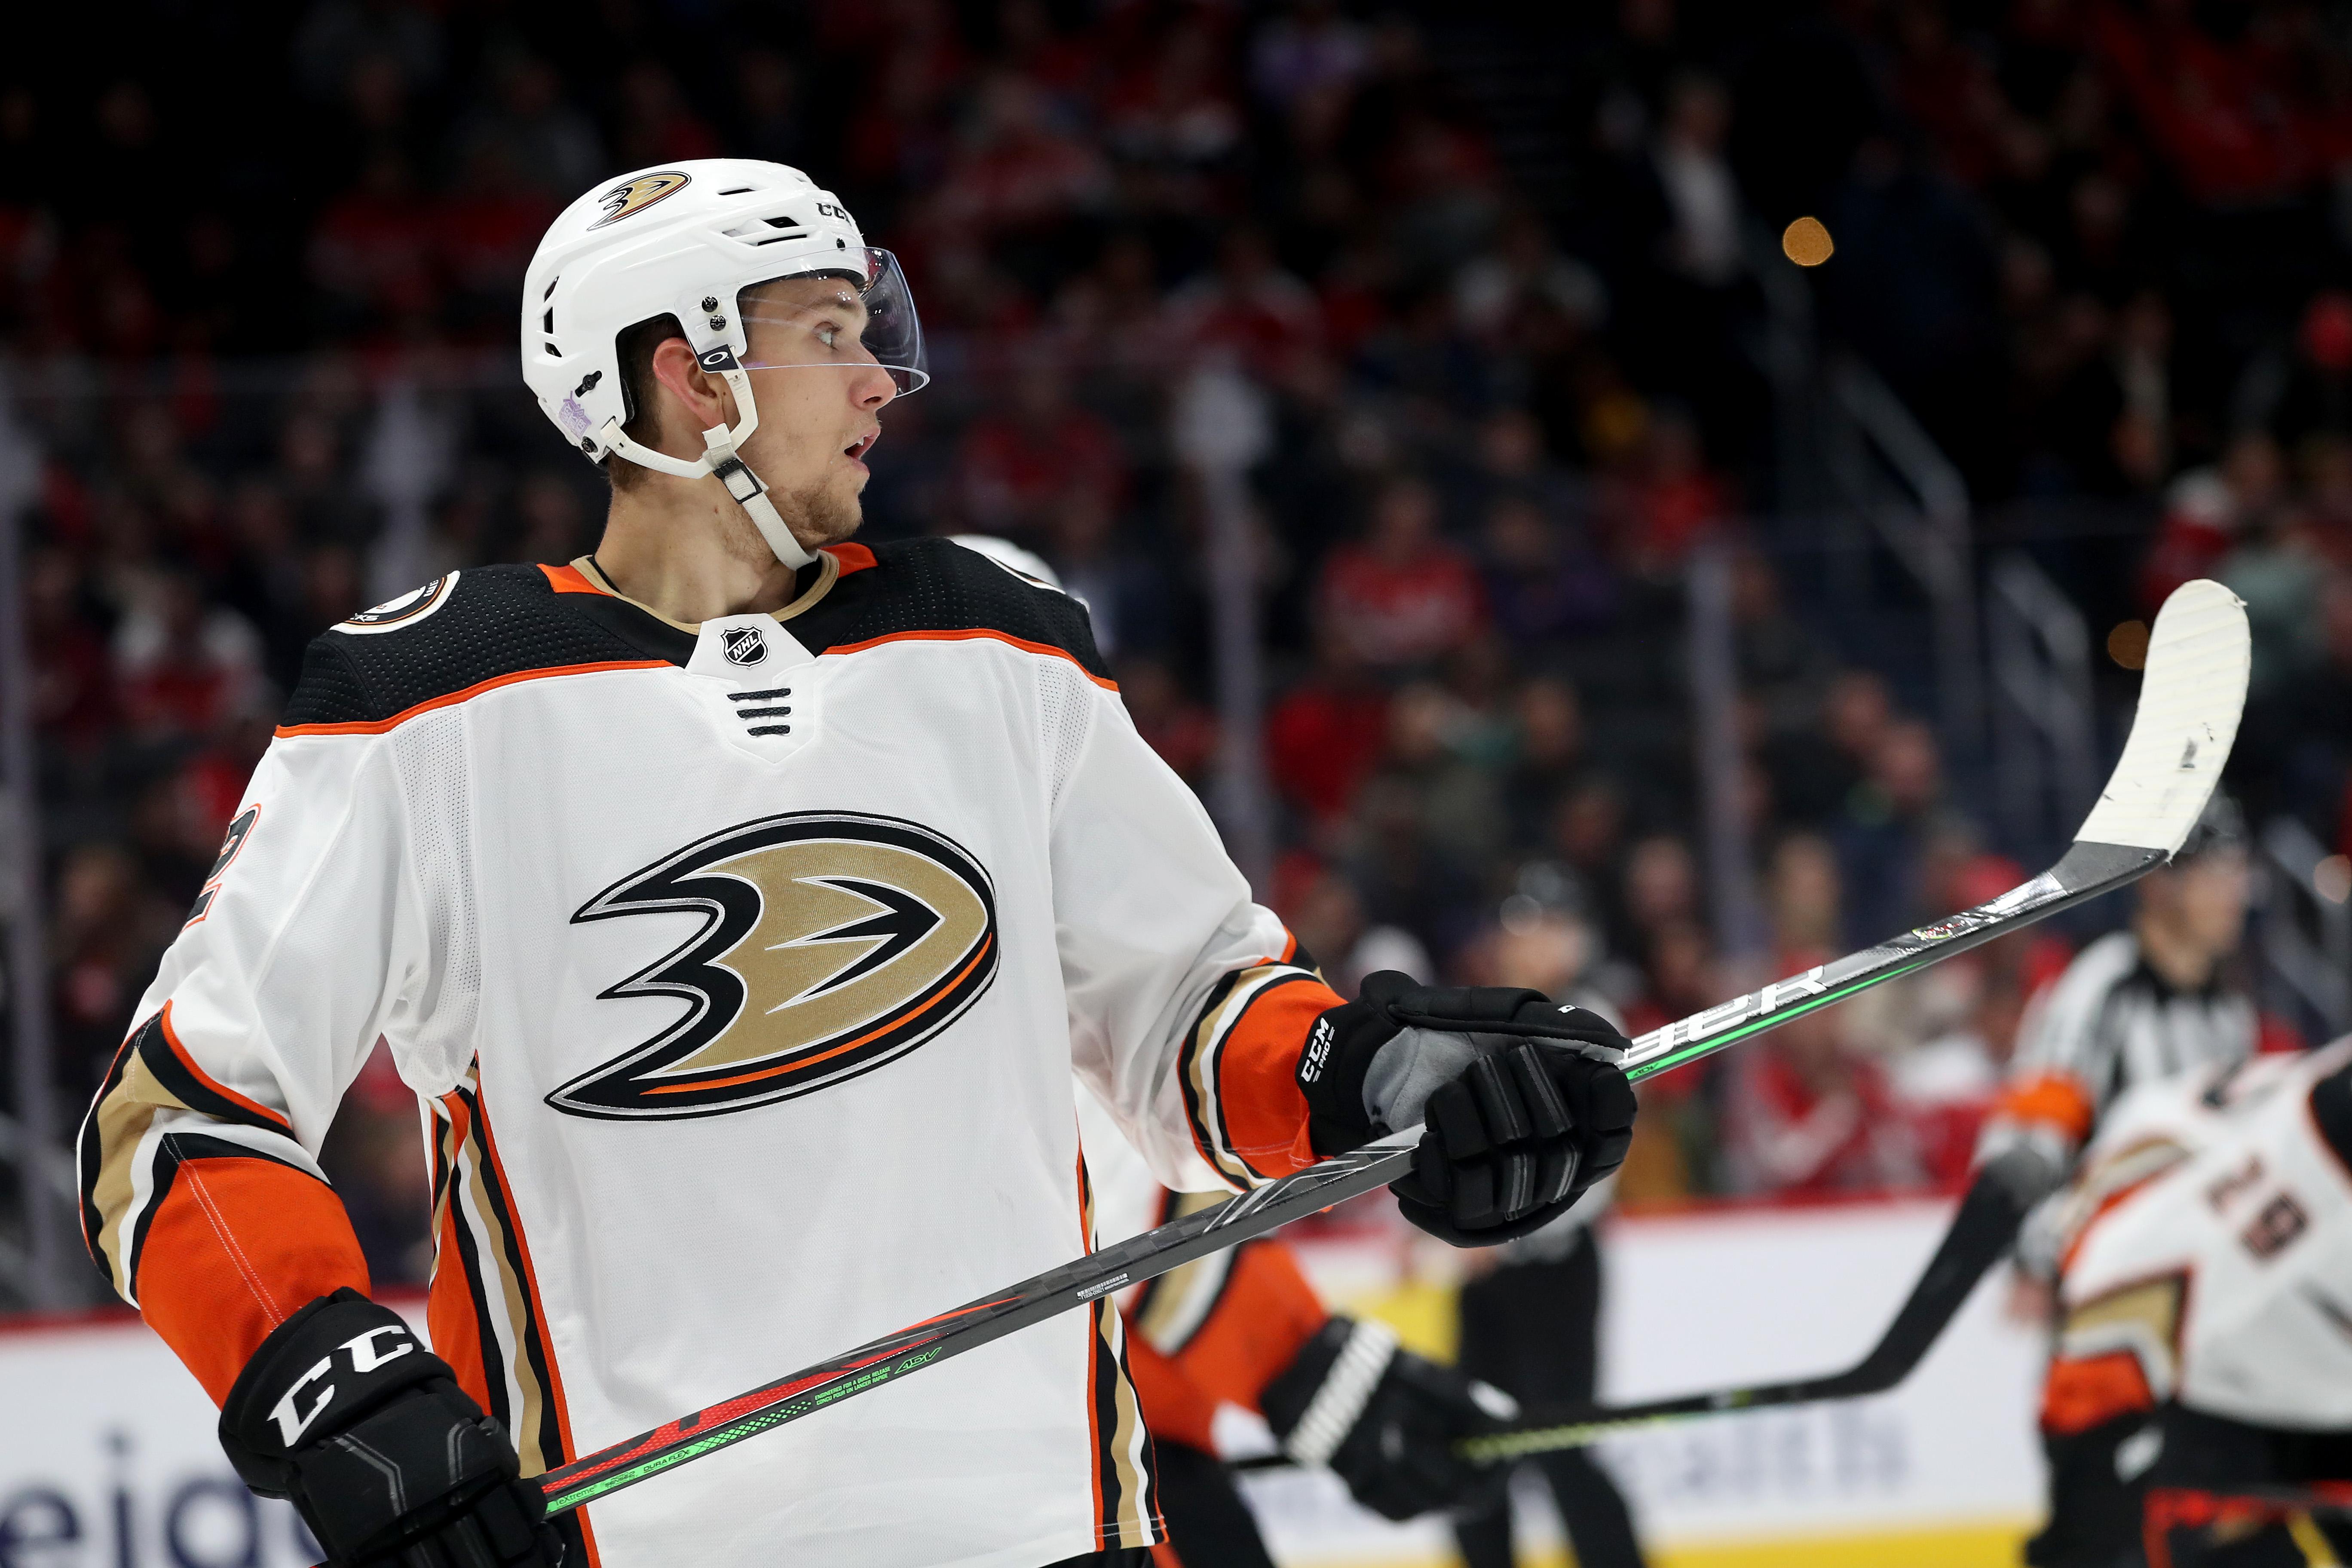 WASHINGTON, DC - NOVEMBER 18: Brendan Guhle #2 of the Anaheim Ducks skates on the ice against the Washington Capitals at Capital One Arena on November 18, 2019 in Washington, DC.